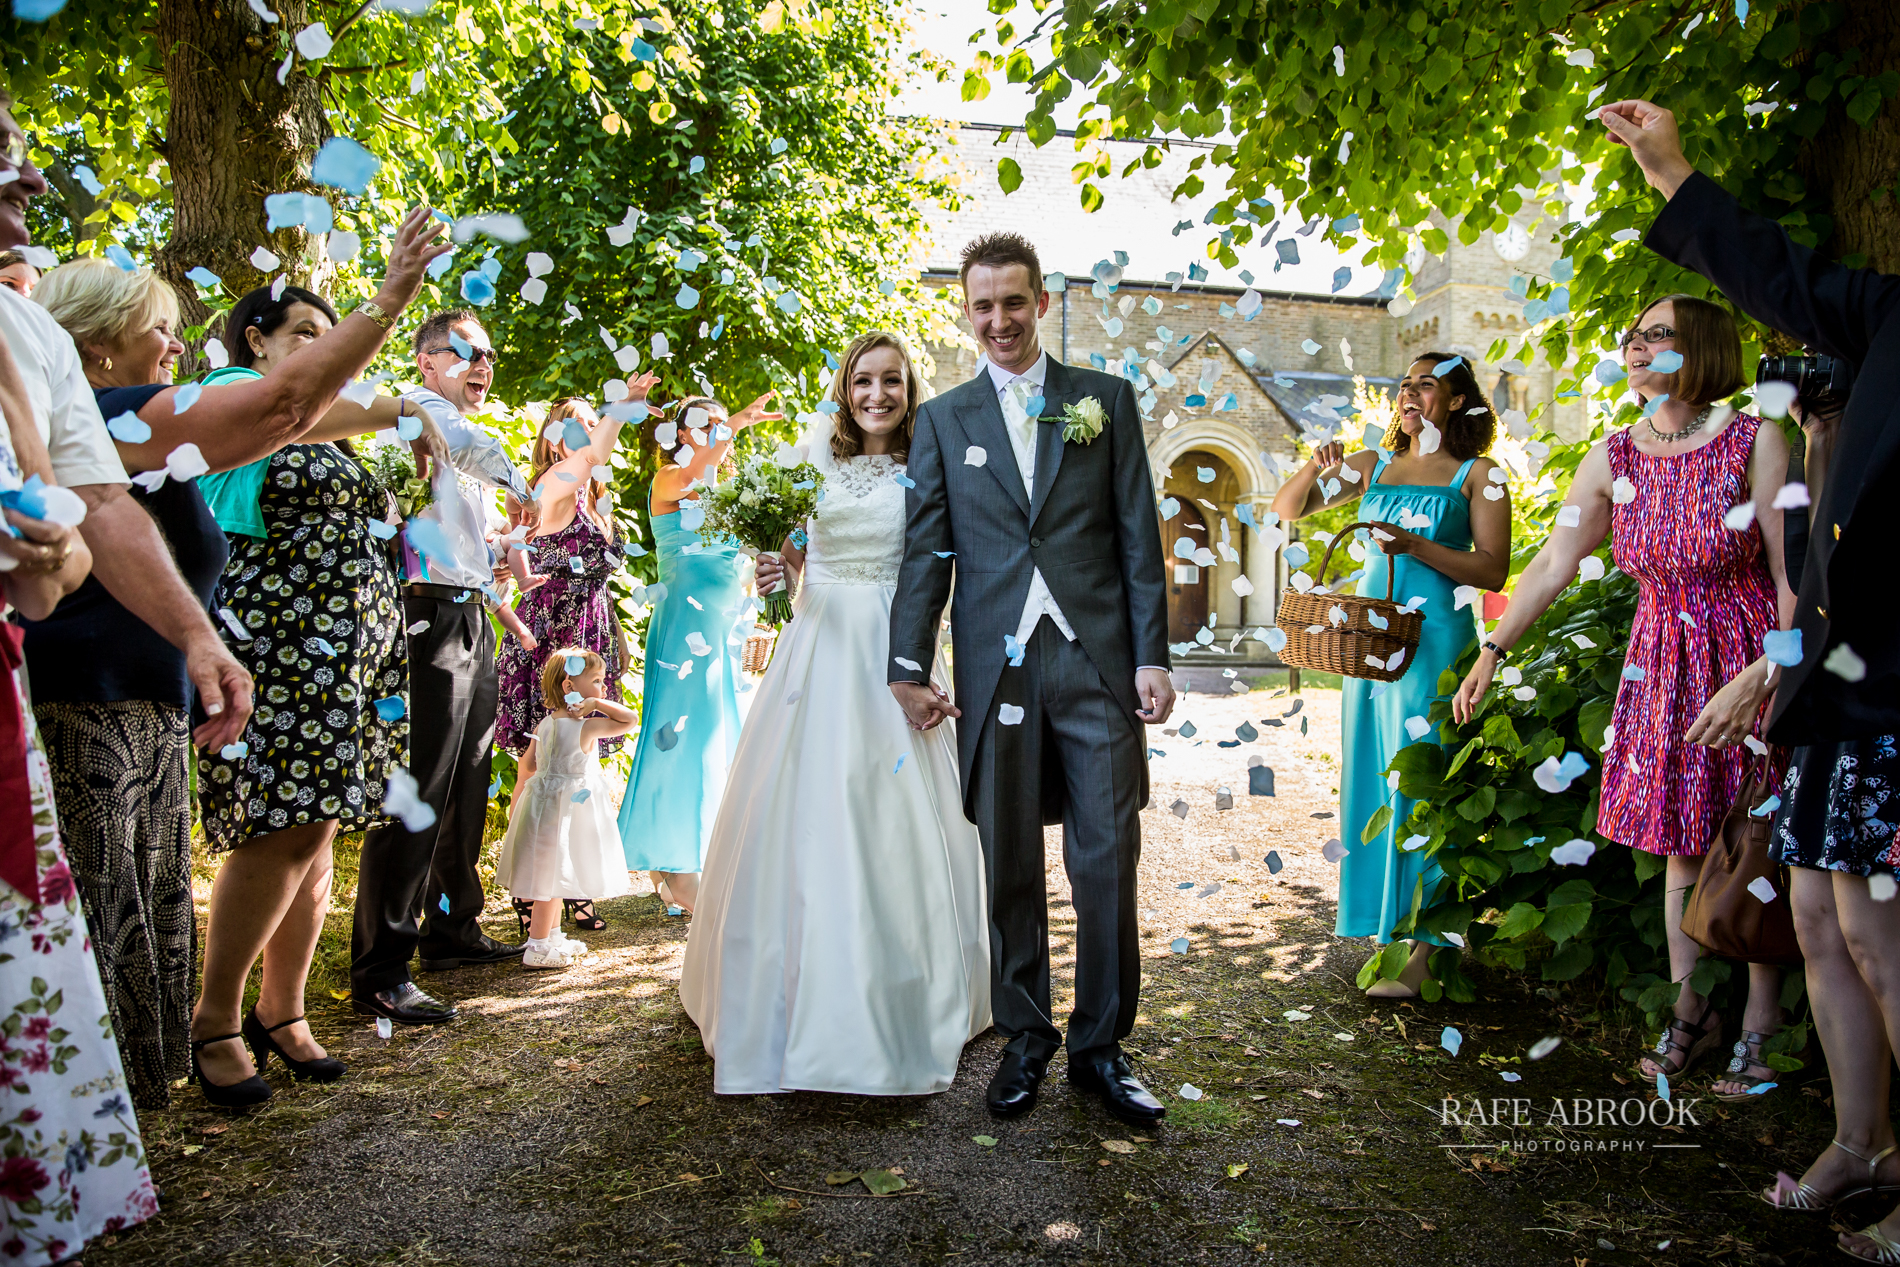 wedding photographer hertfordshire noke thistle hotel st albans -1251.jpg